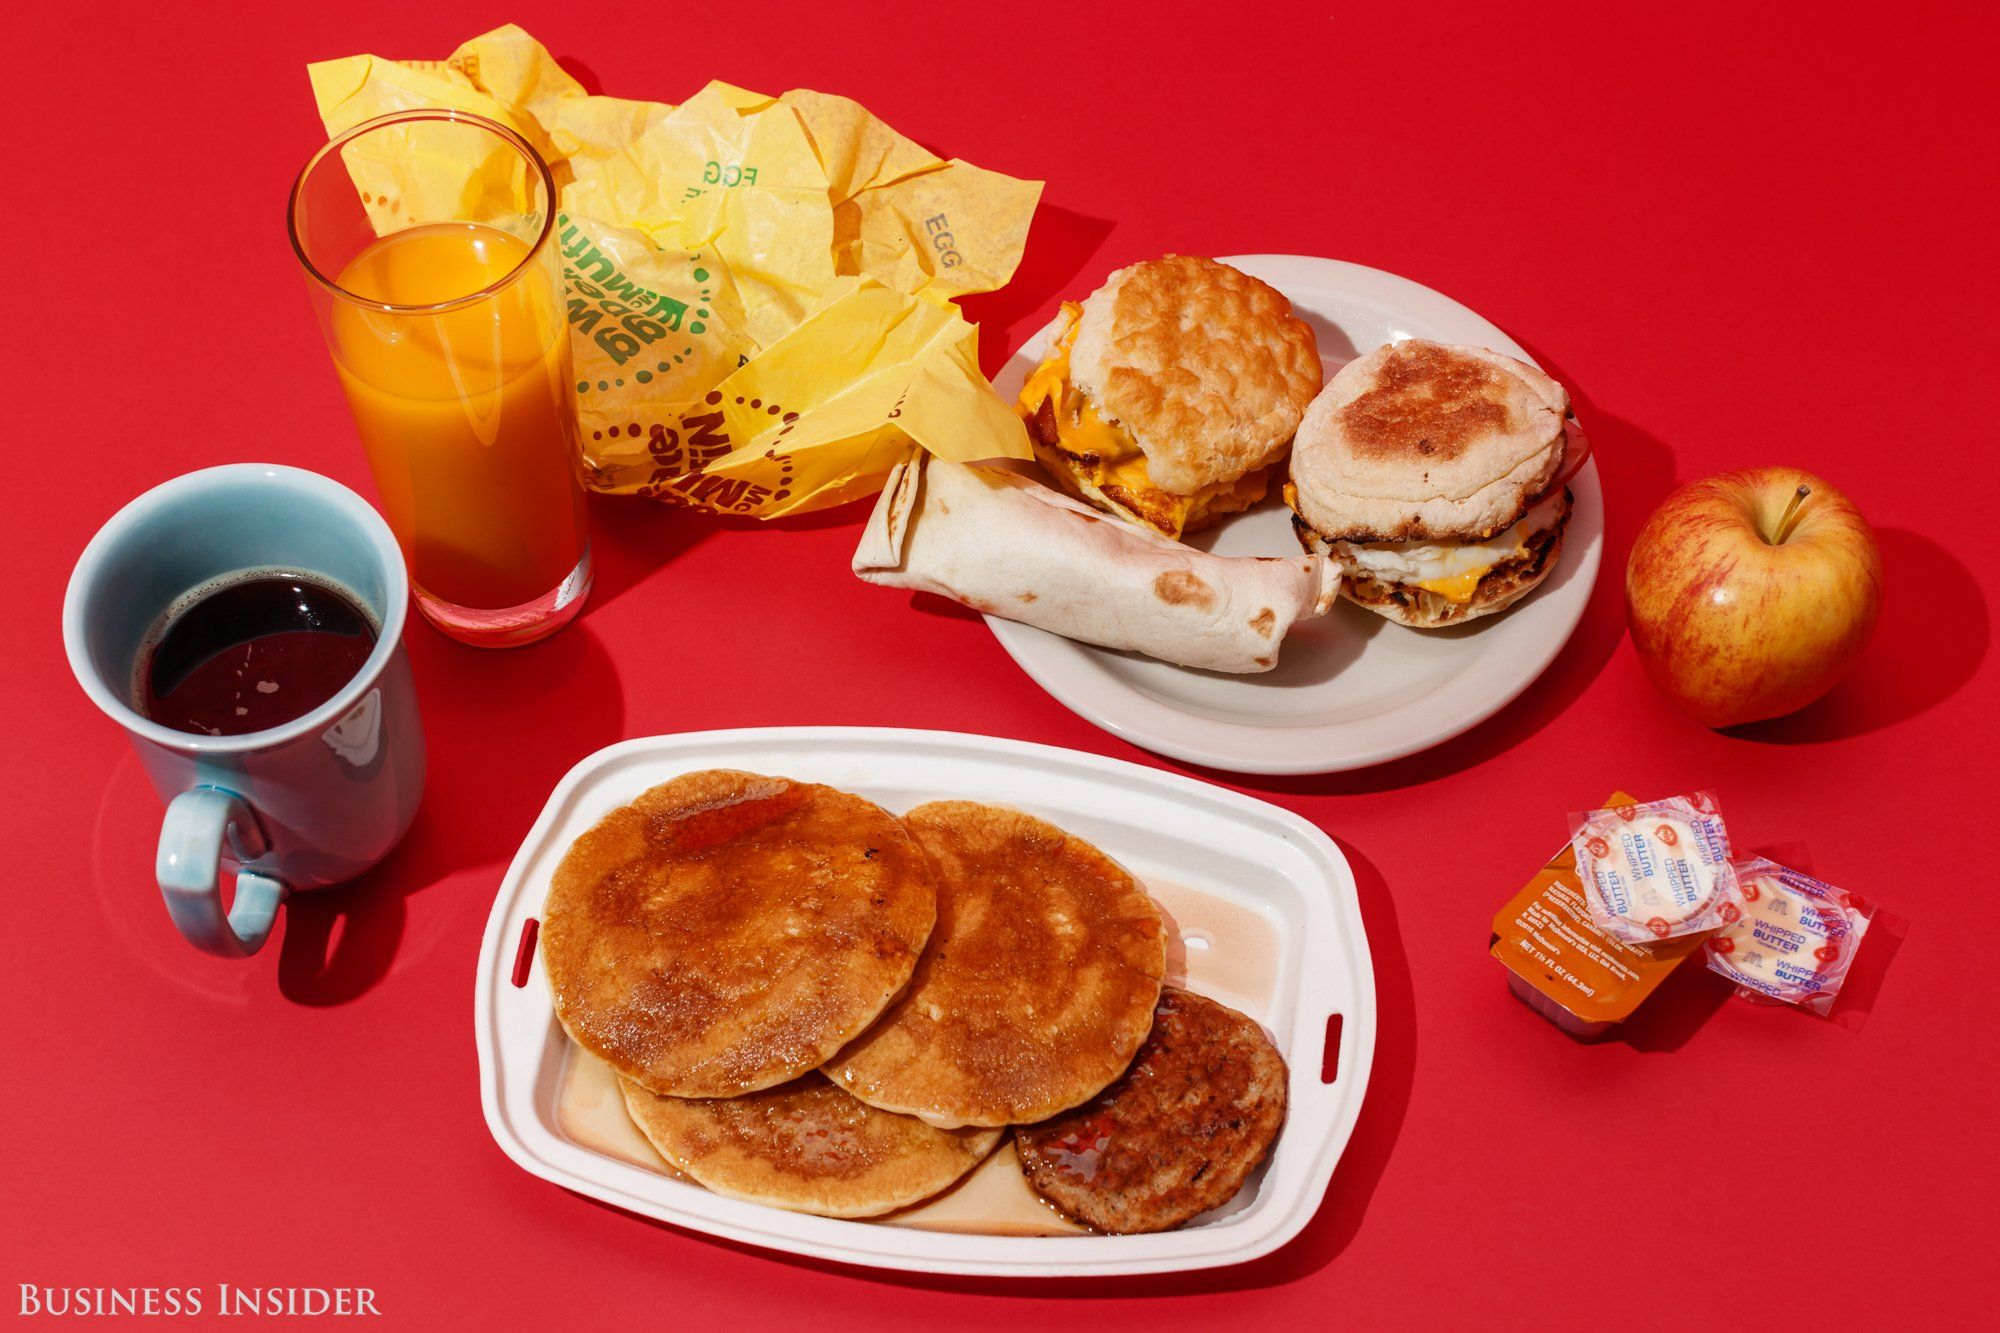 Mcdonald S Breakfast Deal Dollar Menu Reveal New Strategy Healthy Fast Food Breakfast Food Healthy Breakfast Menu